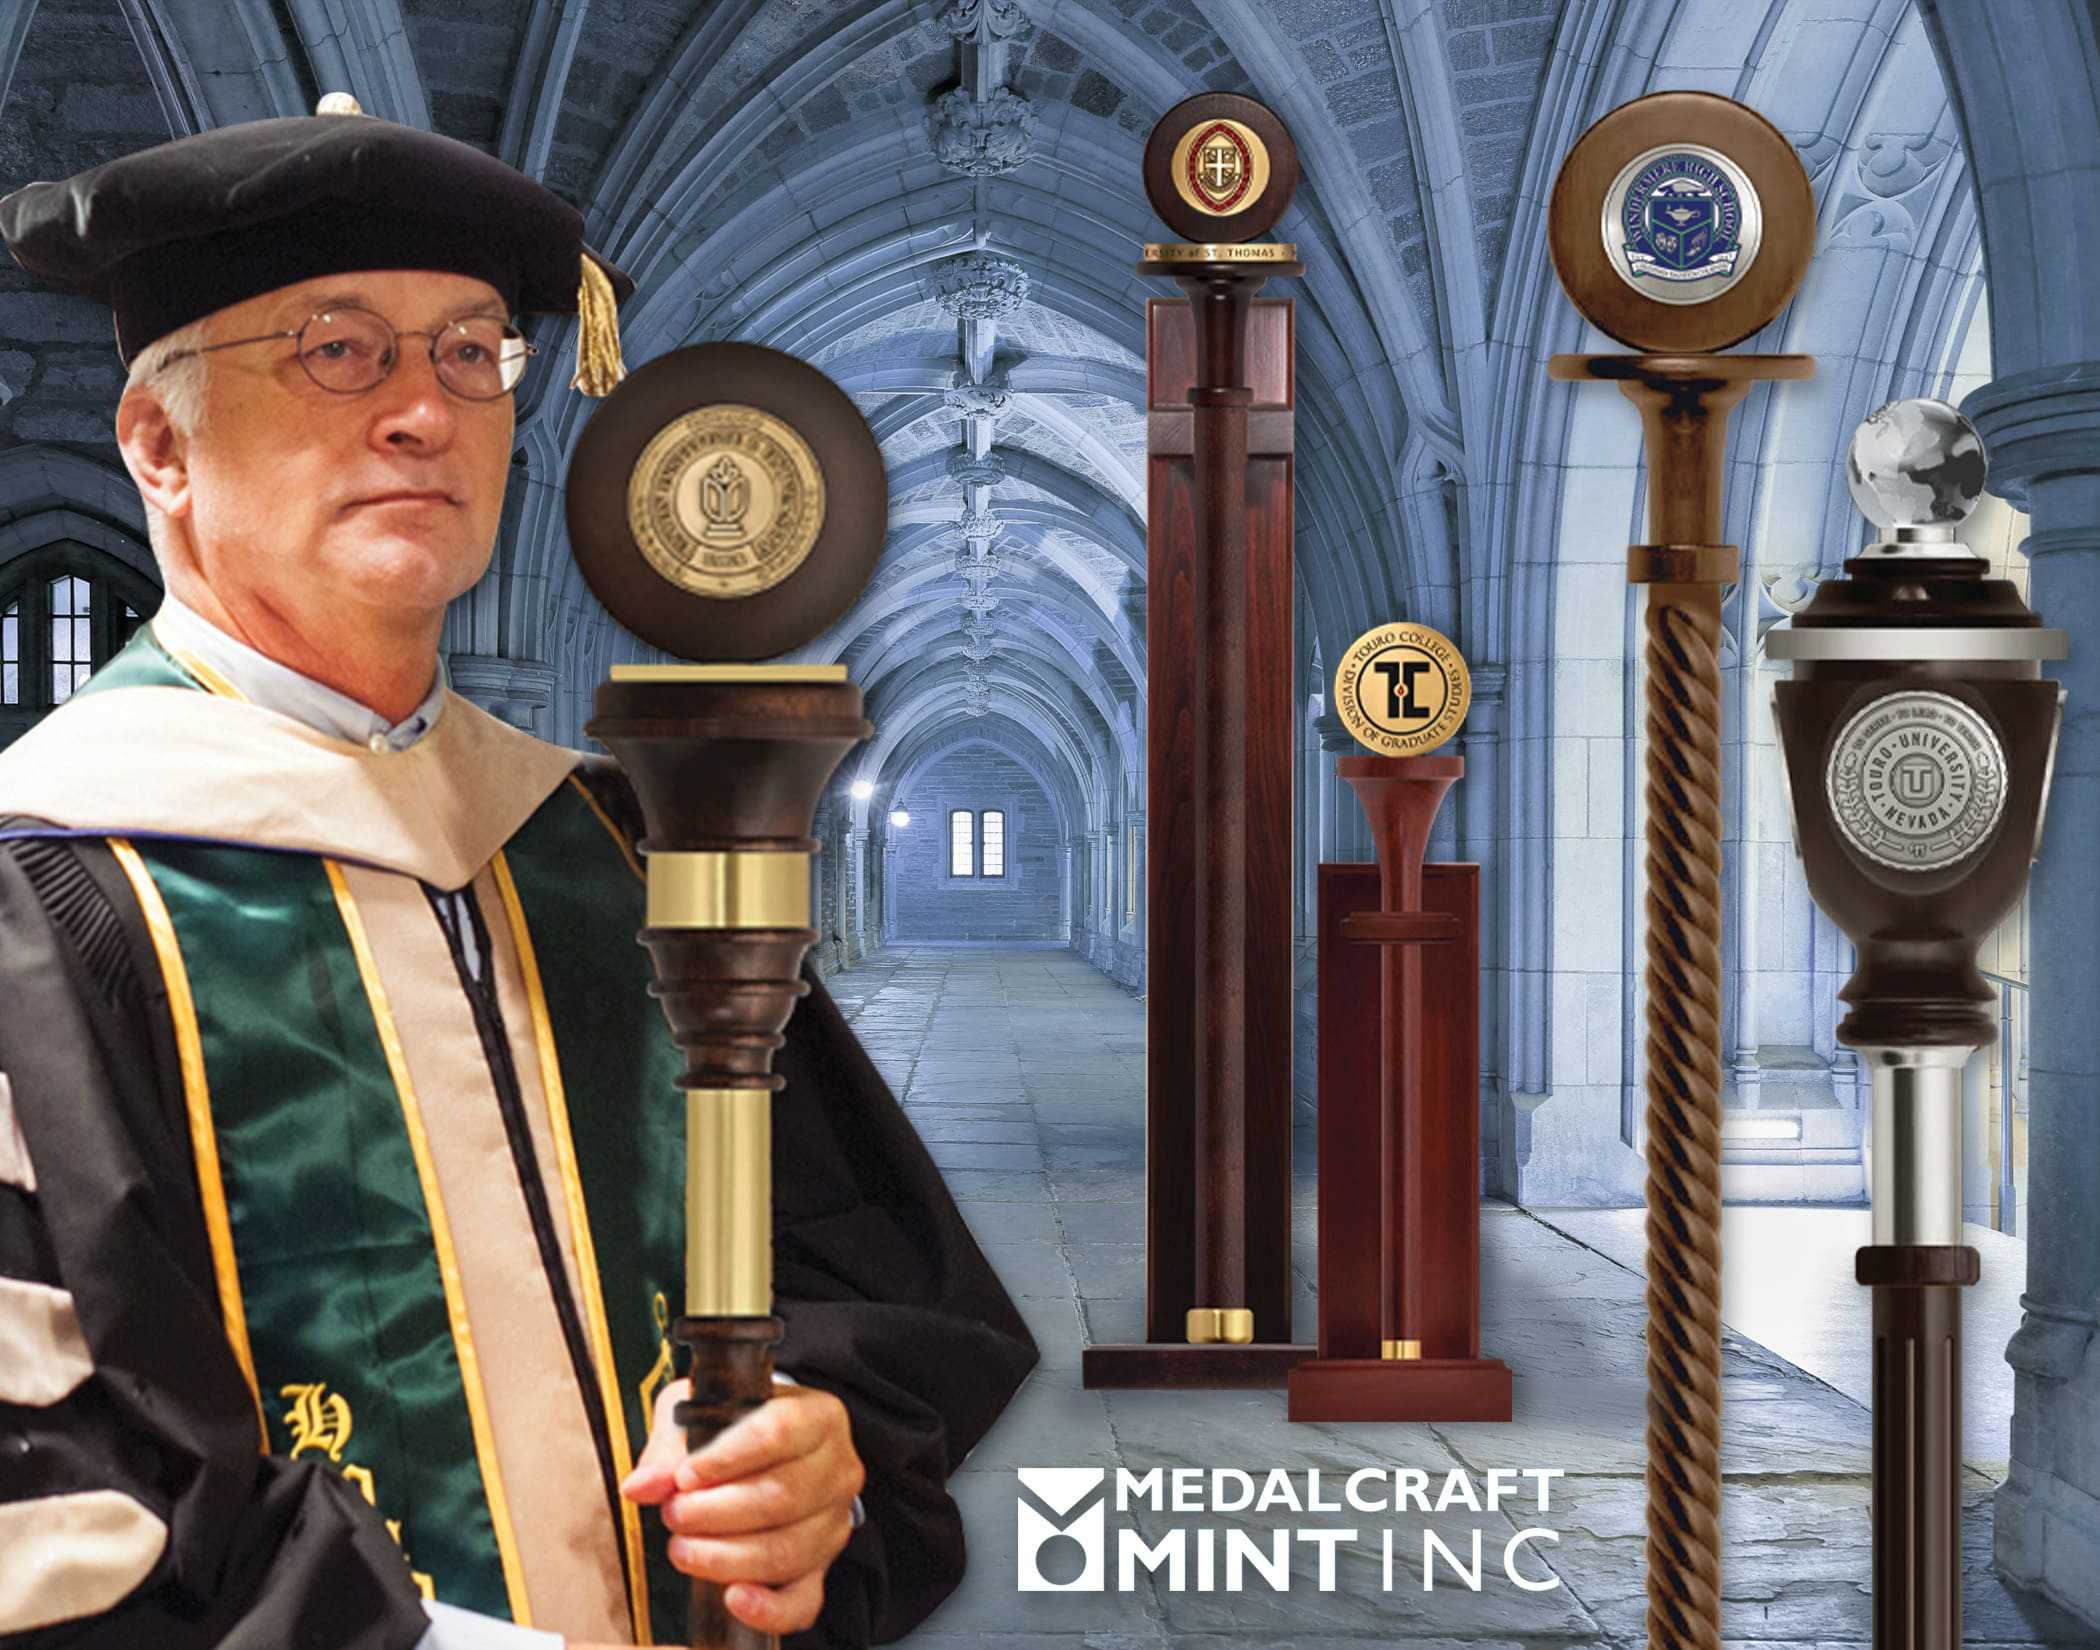 Medalcraft Mint ceremonial mace